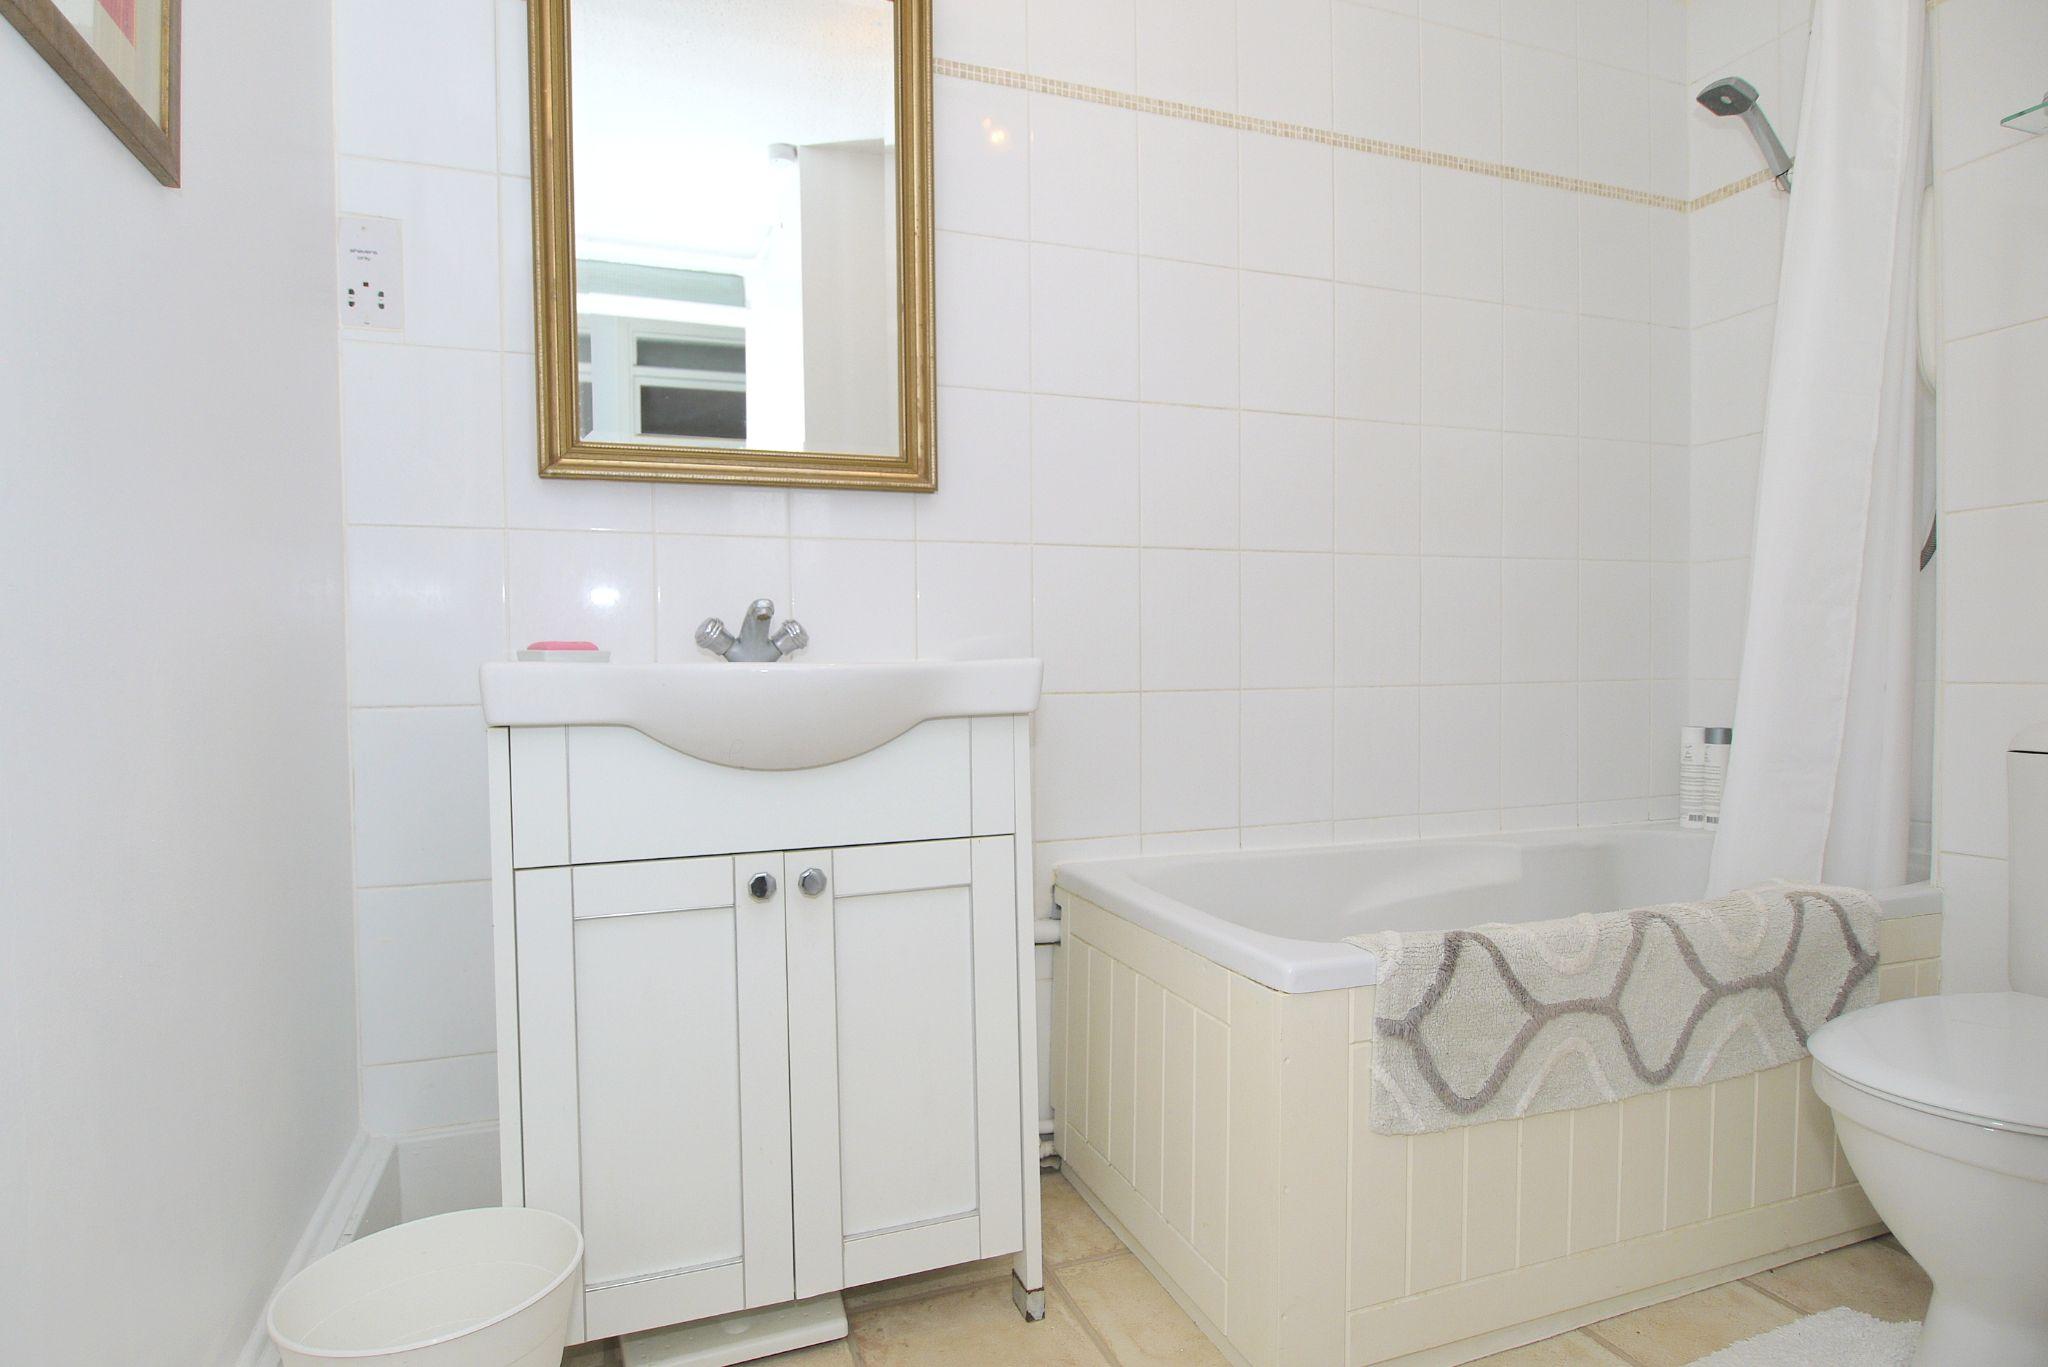 1 bedroom apartment flat/apartment Sold in Sevenoaks - Photograph 6